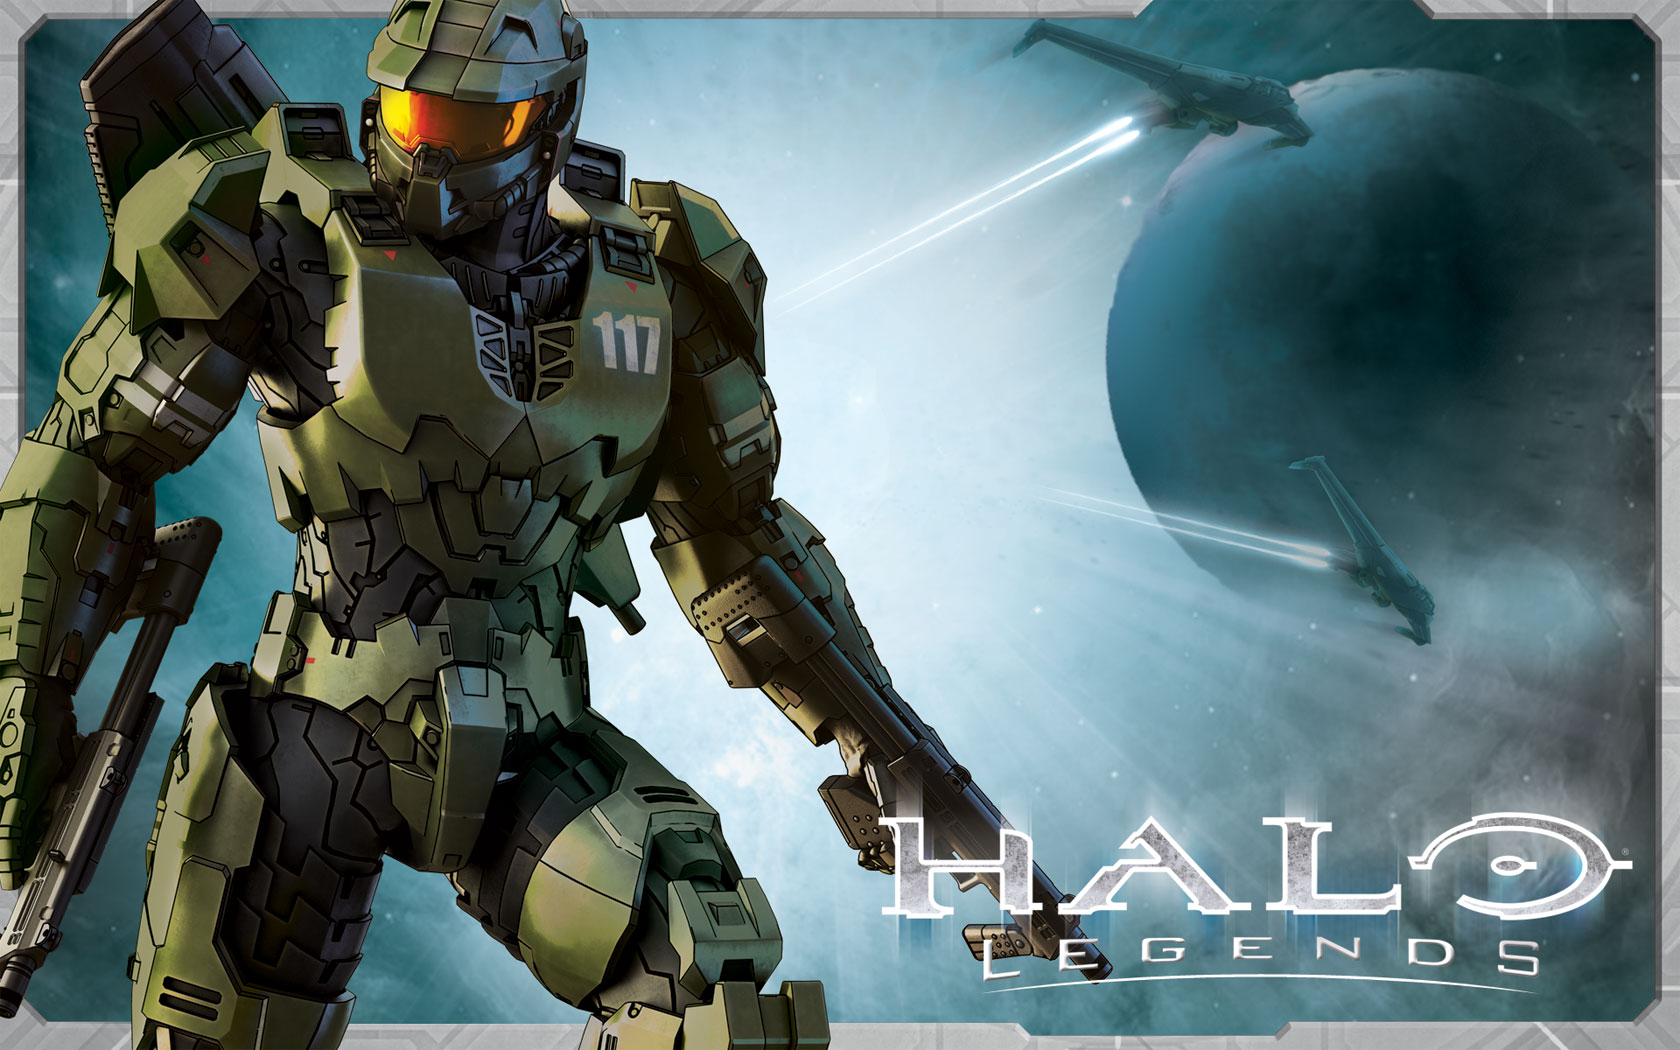 Halo Legends #5